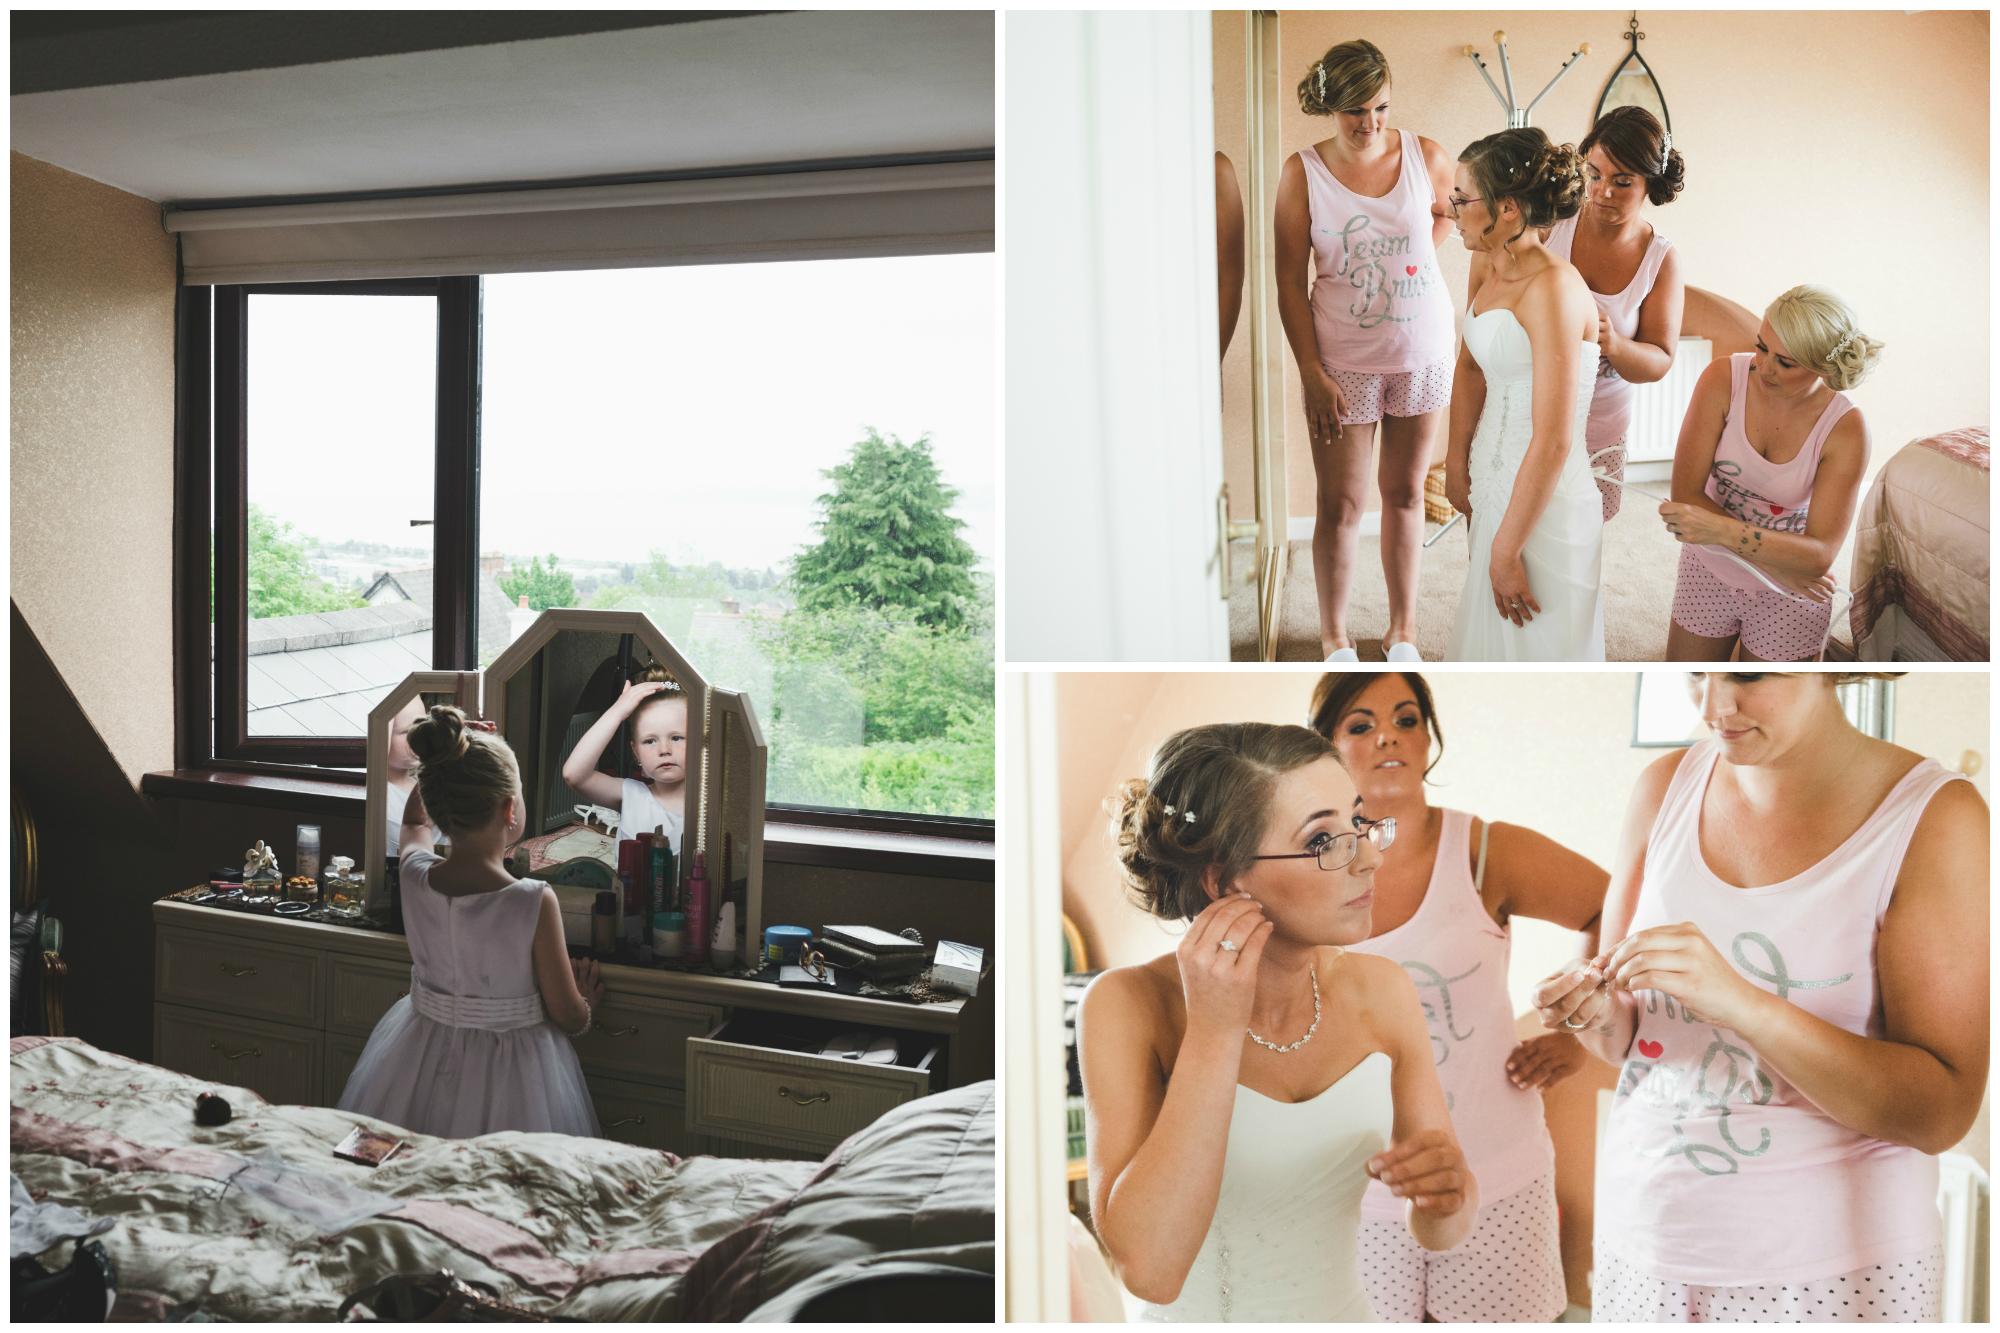 Ballymac_hotel_wedding_lisburn_bride_flower_girl_daughter_ready